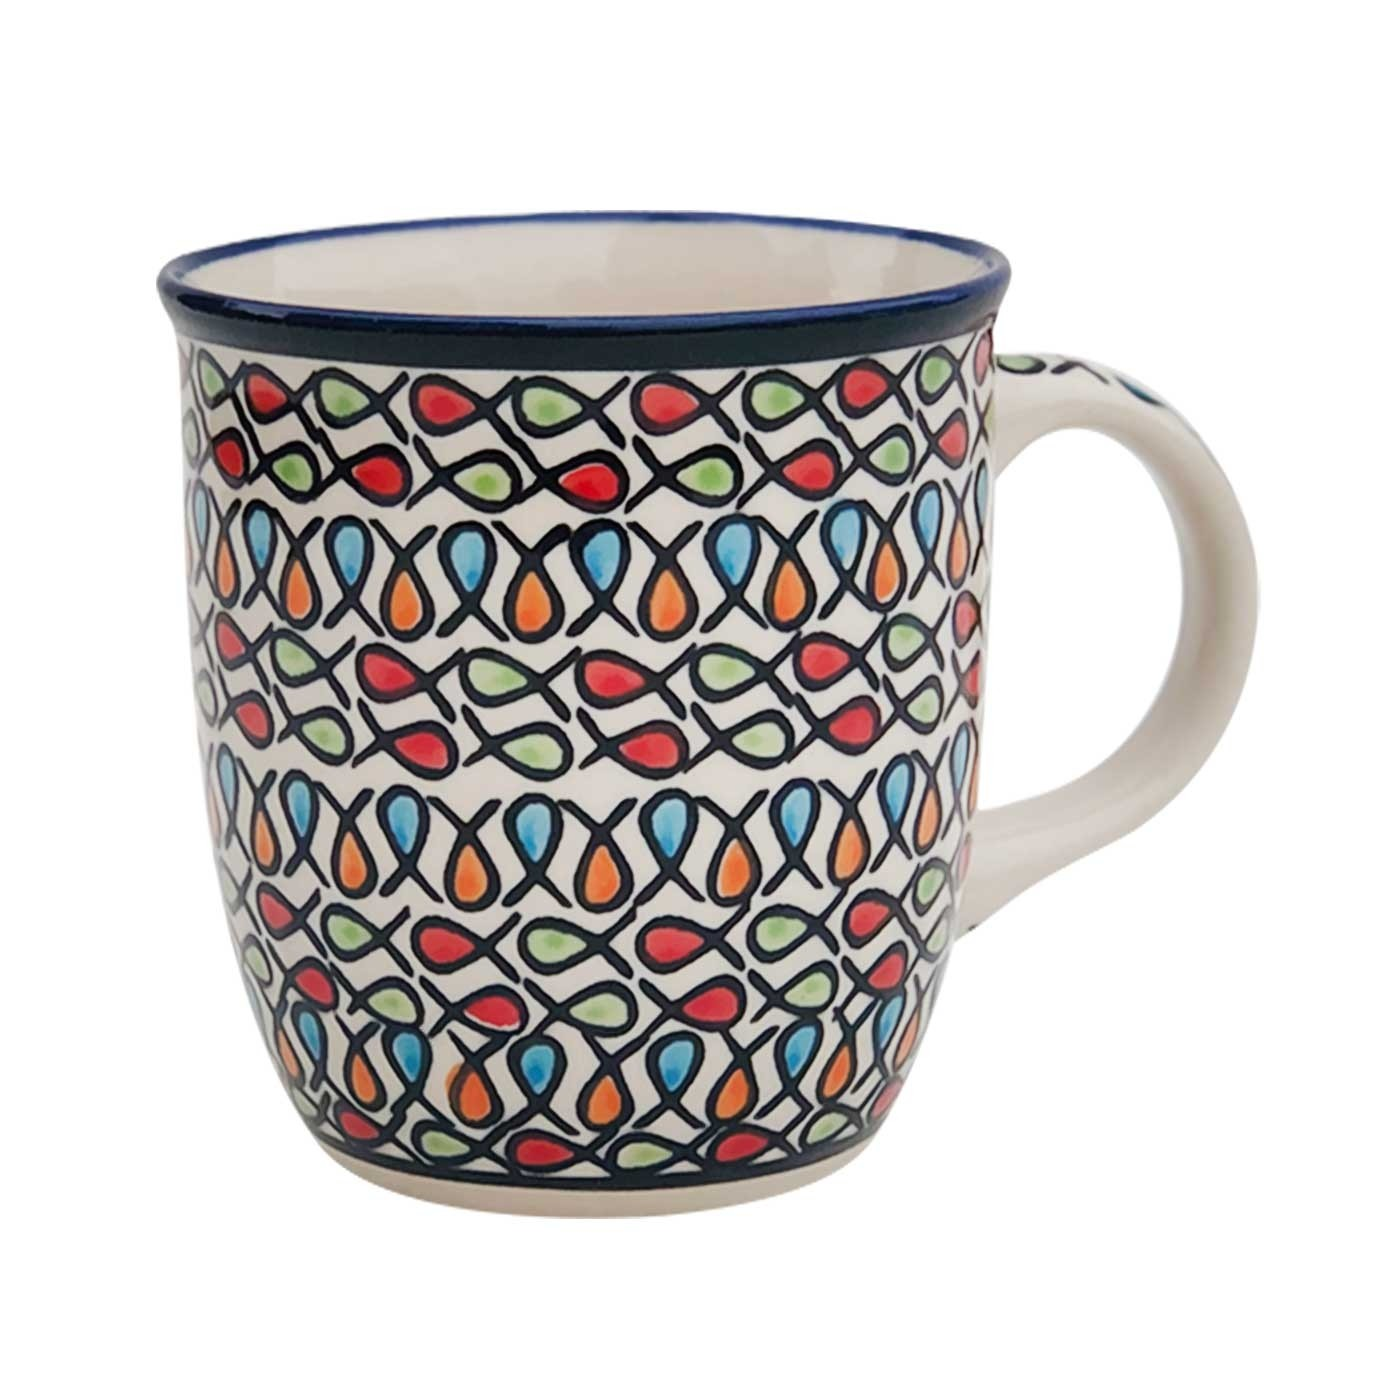 Pottery Avenue 12-oz Standare Mug - 1105-DU221 Color Me Love